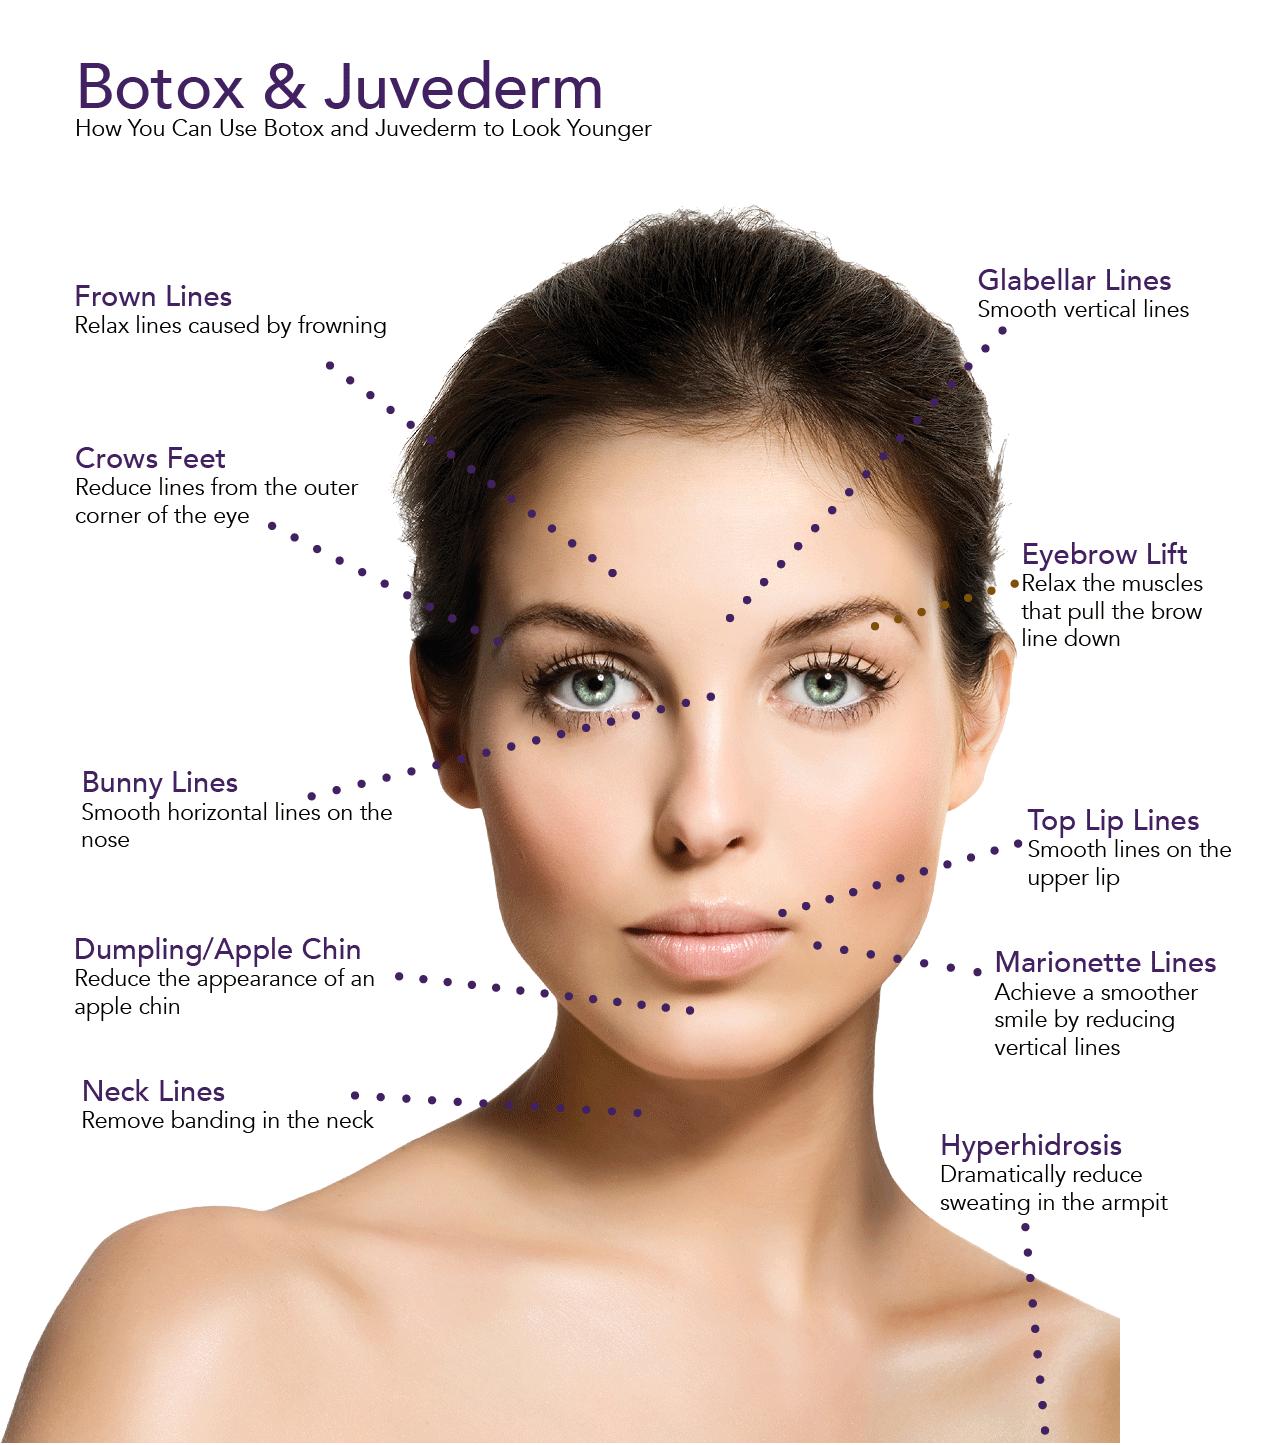 medium resolution of botox juvederm diagram of face